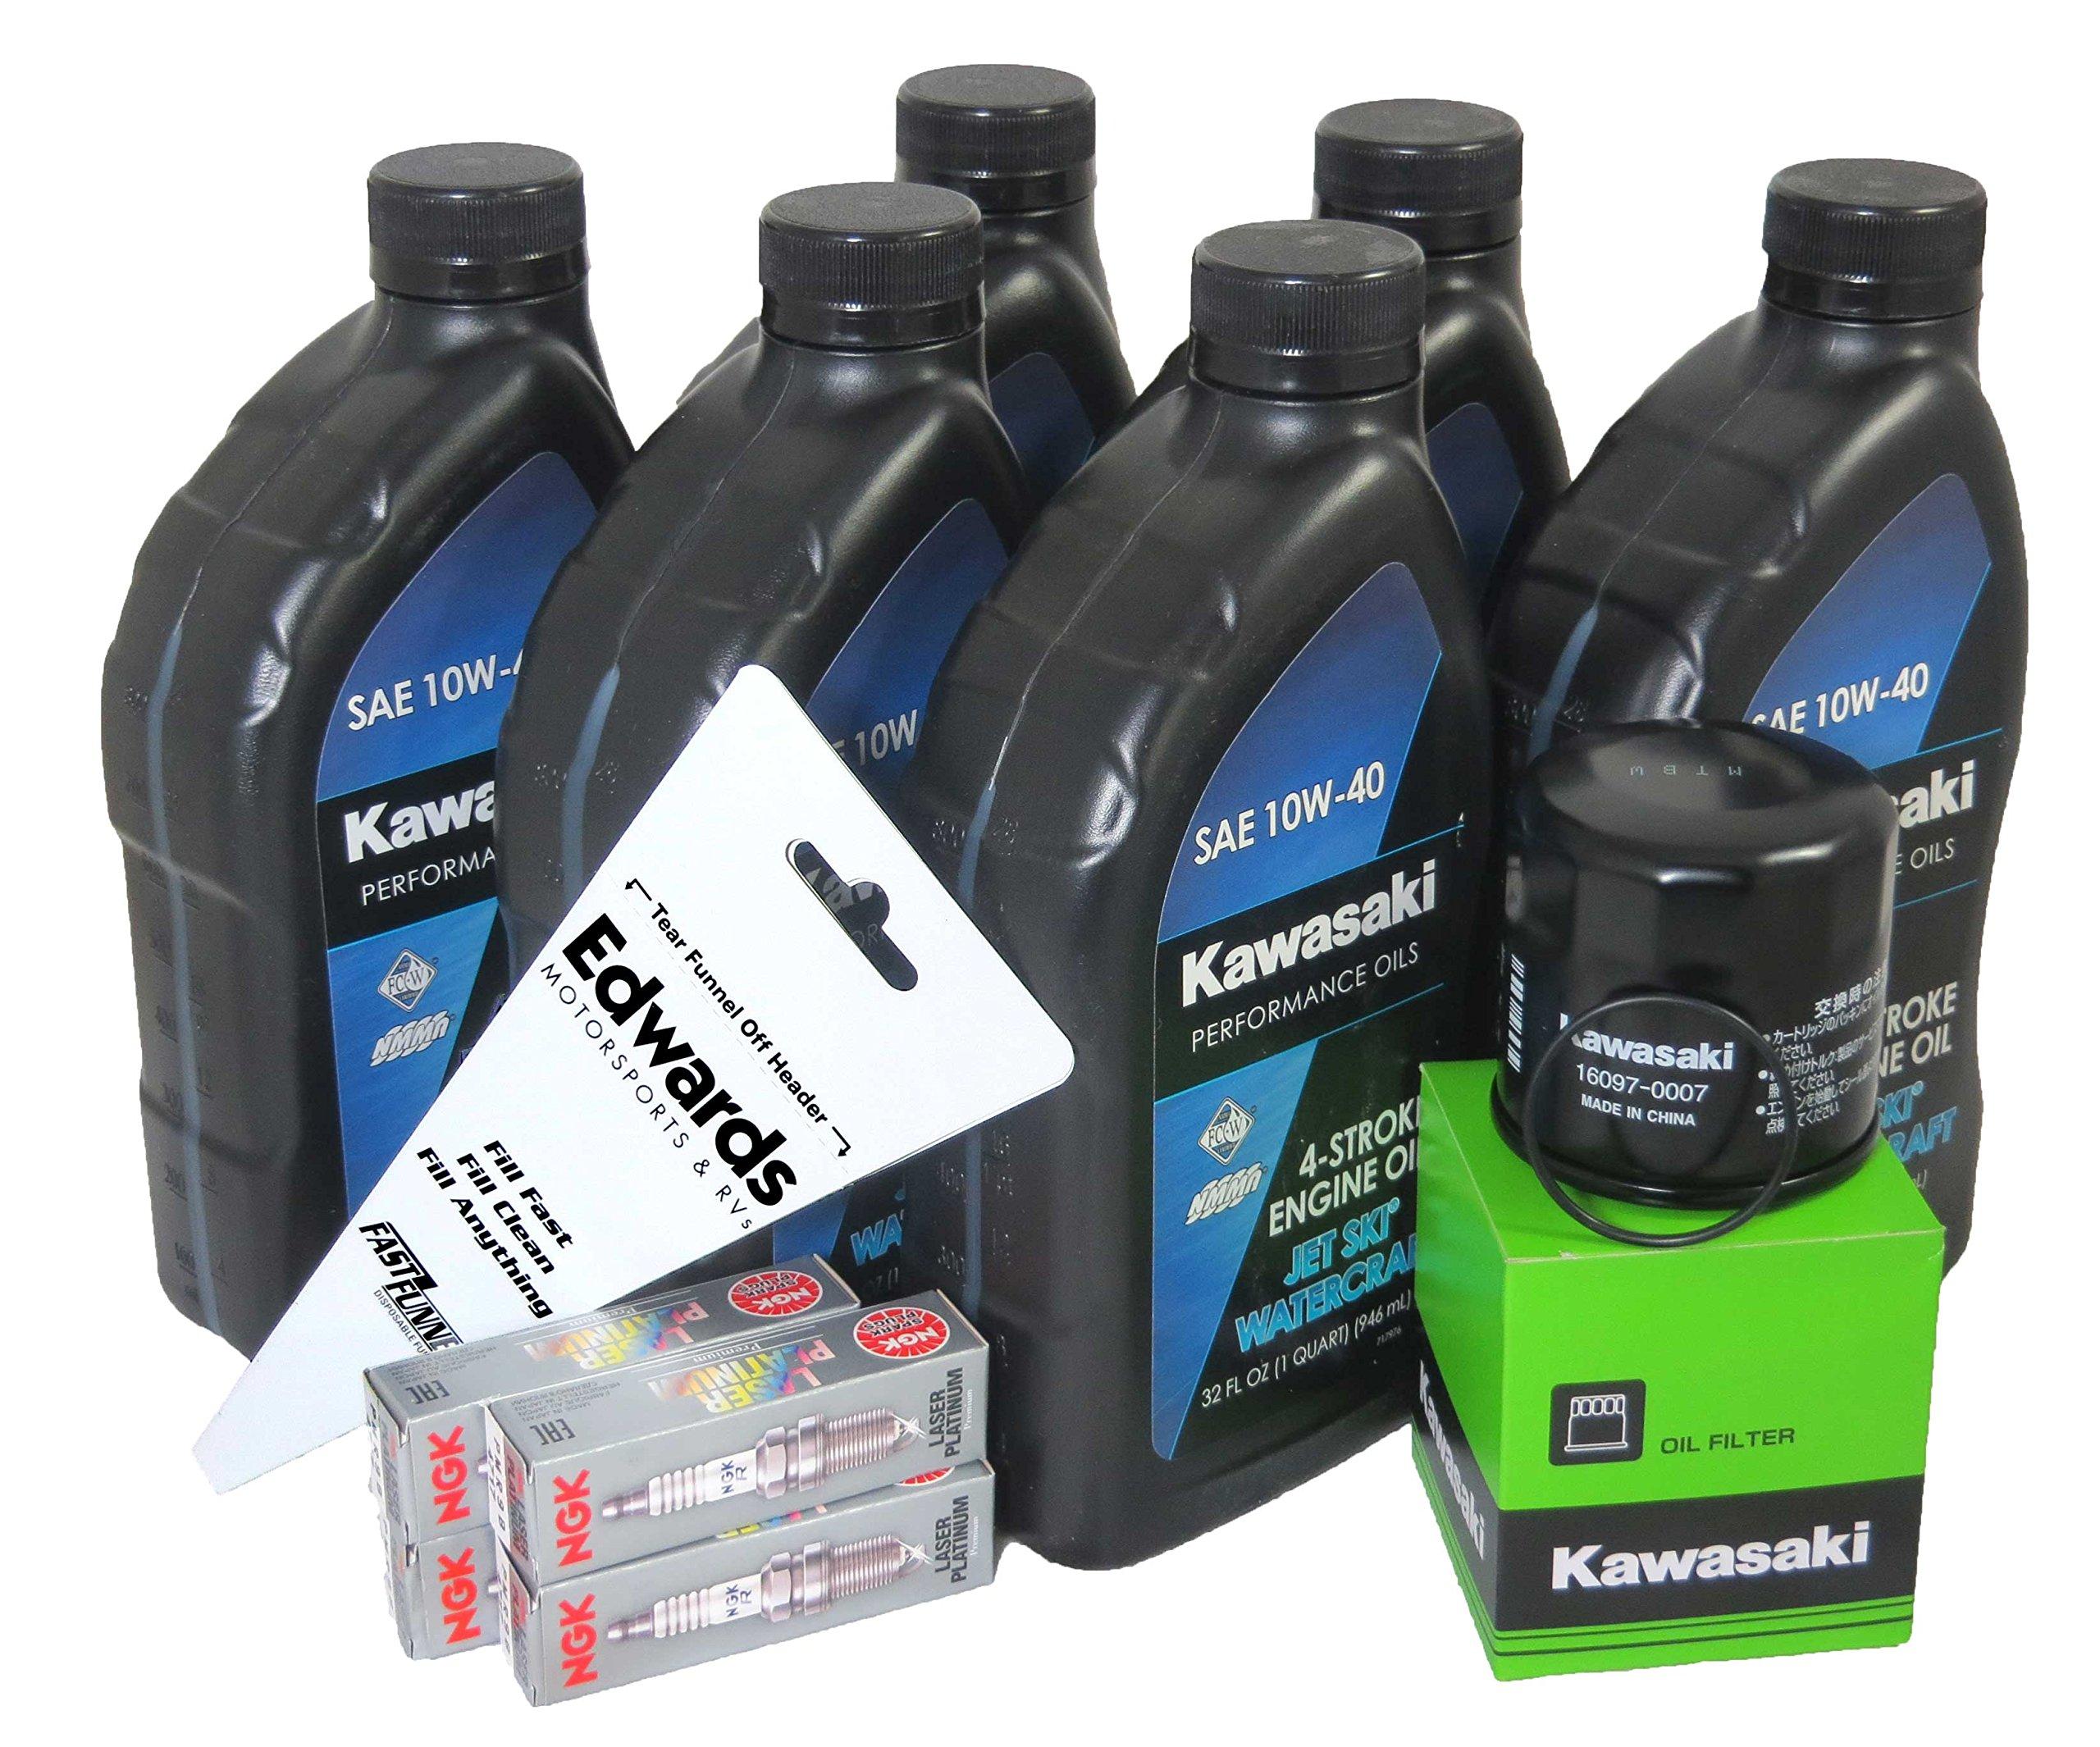 2011-2017 Kawasaki Ultra 300 310 Jet Ski Maintenance Kit